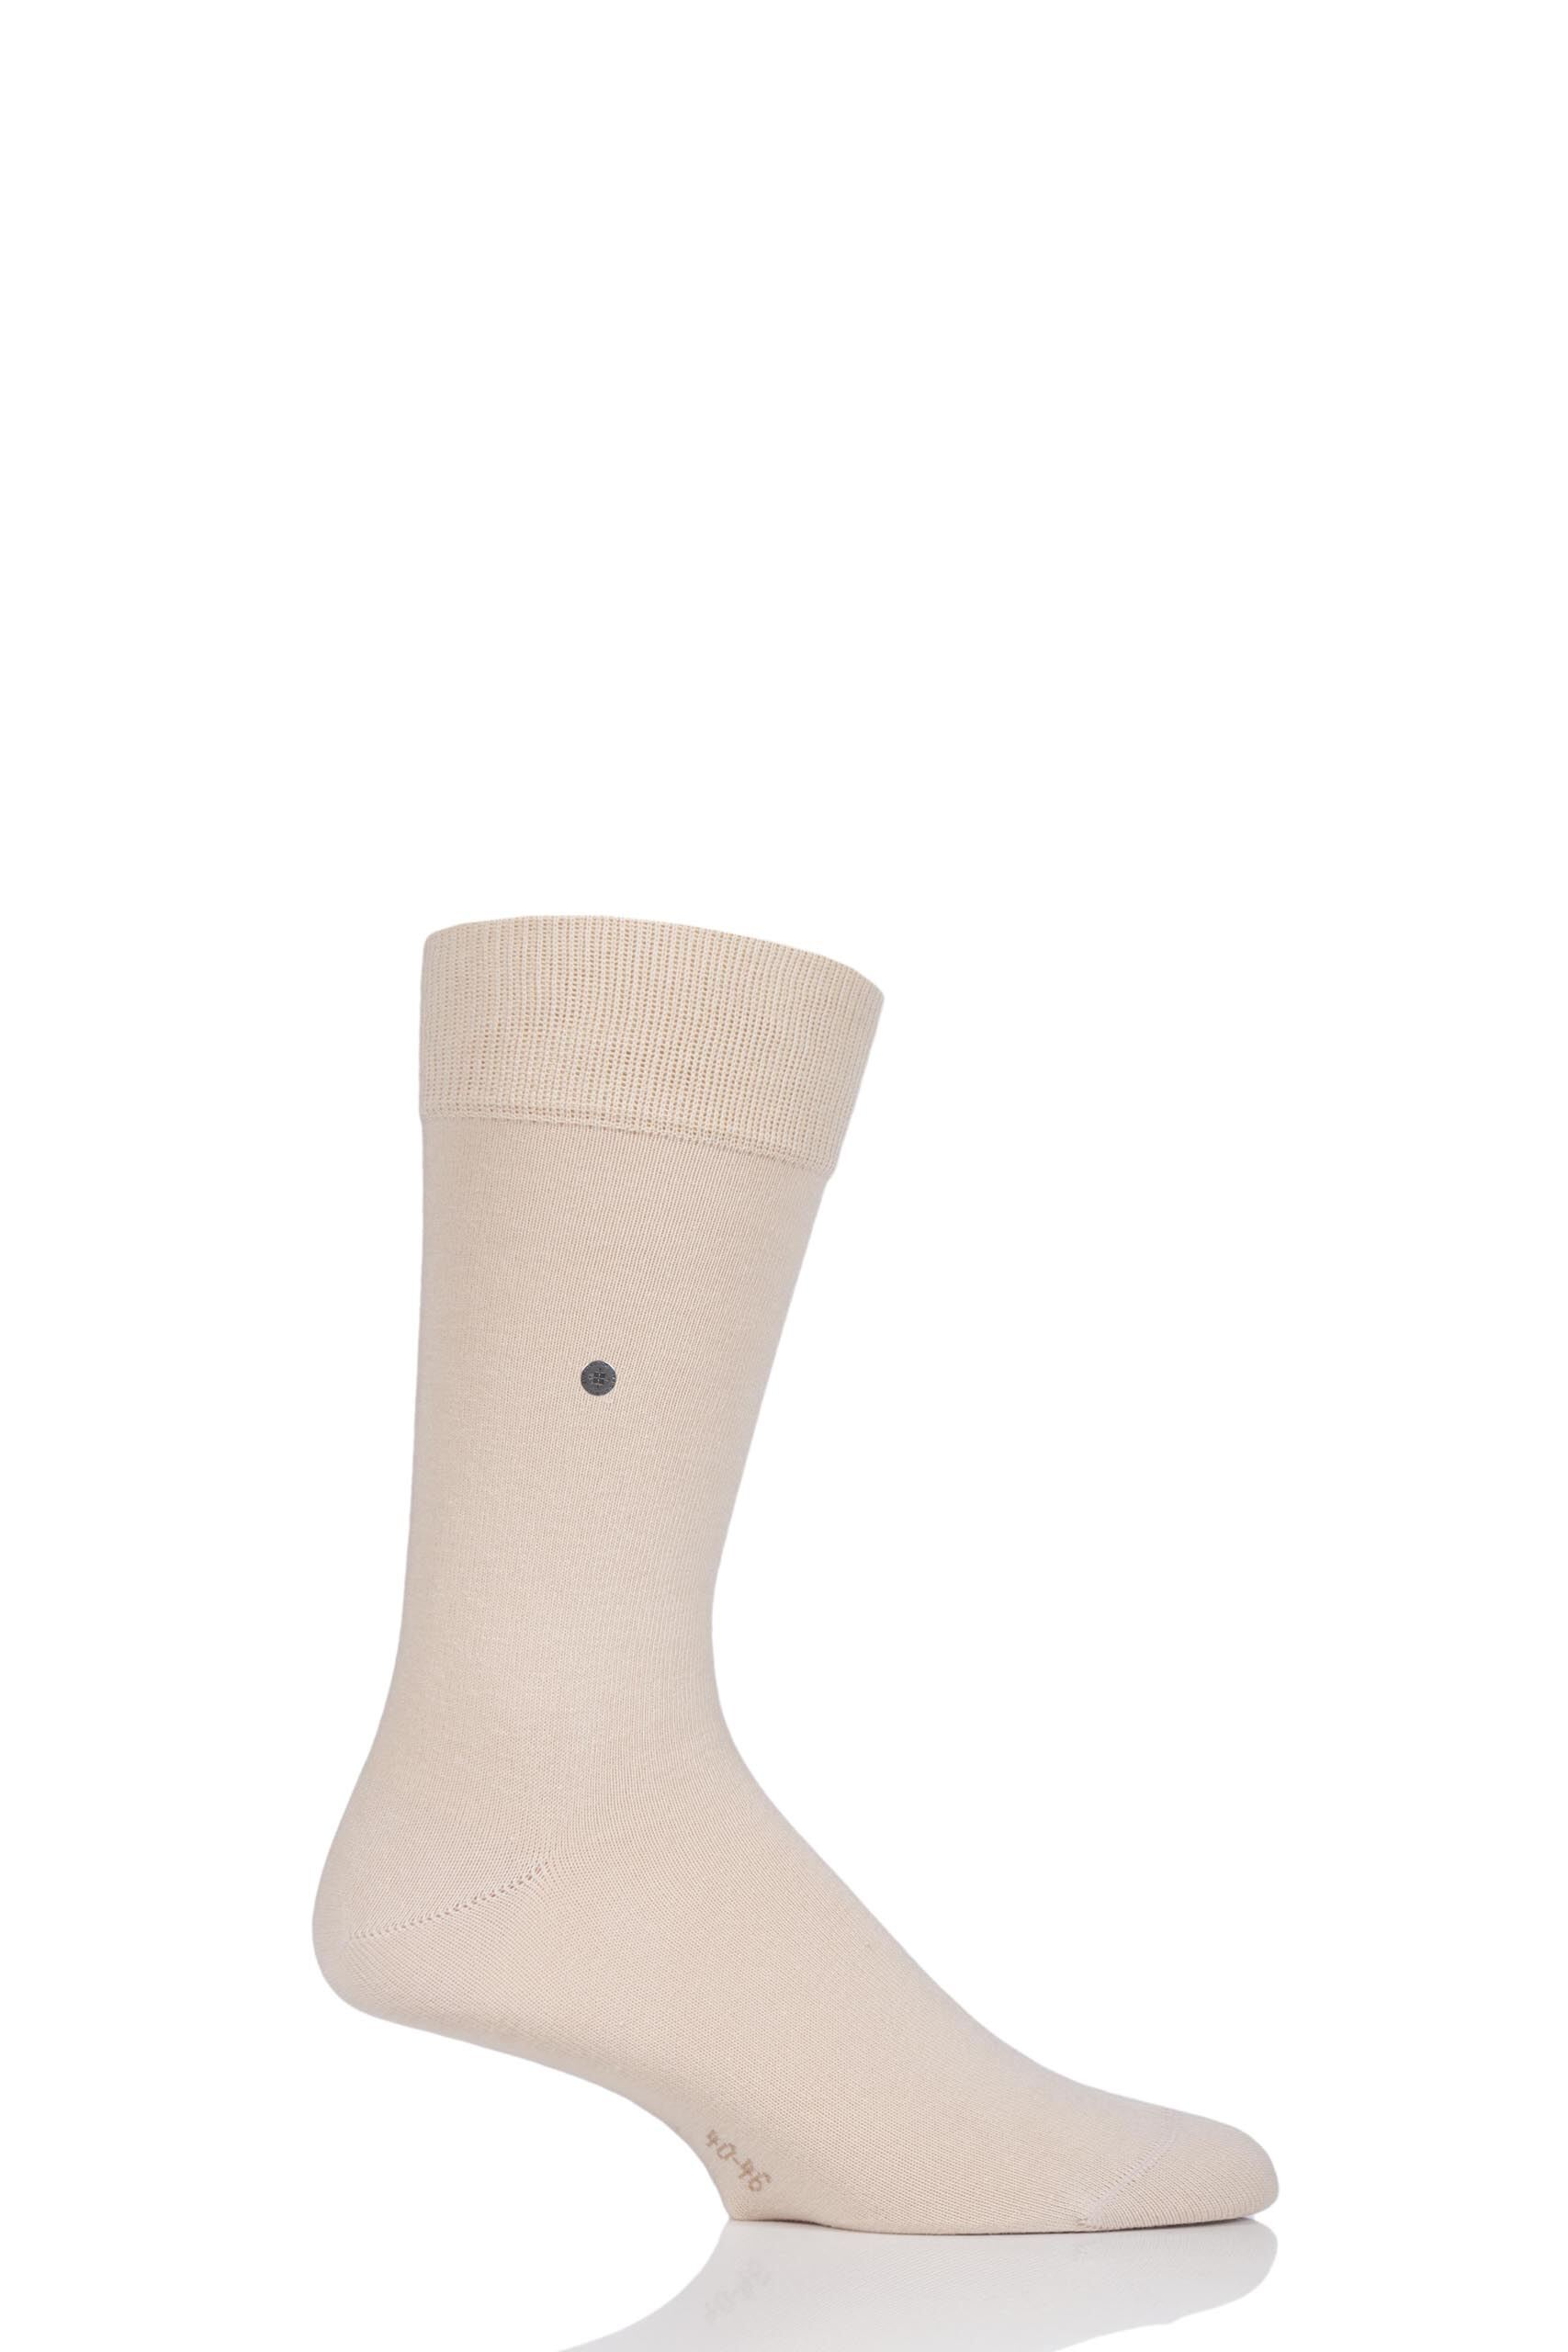 Image of 1 Pair Beige Lord Plain Cotton Socks Men's 6.5-11 Mens - Burlington